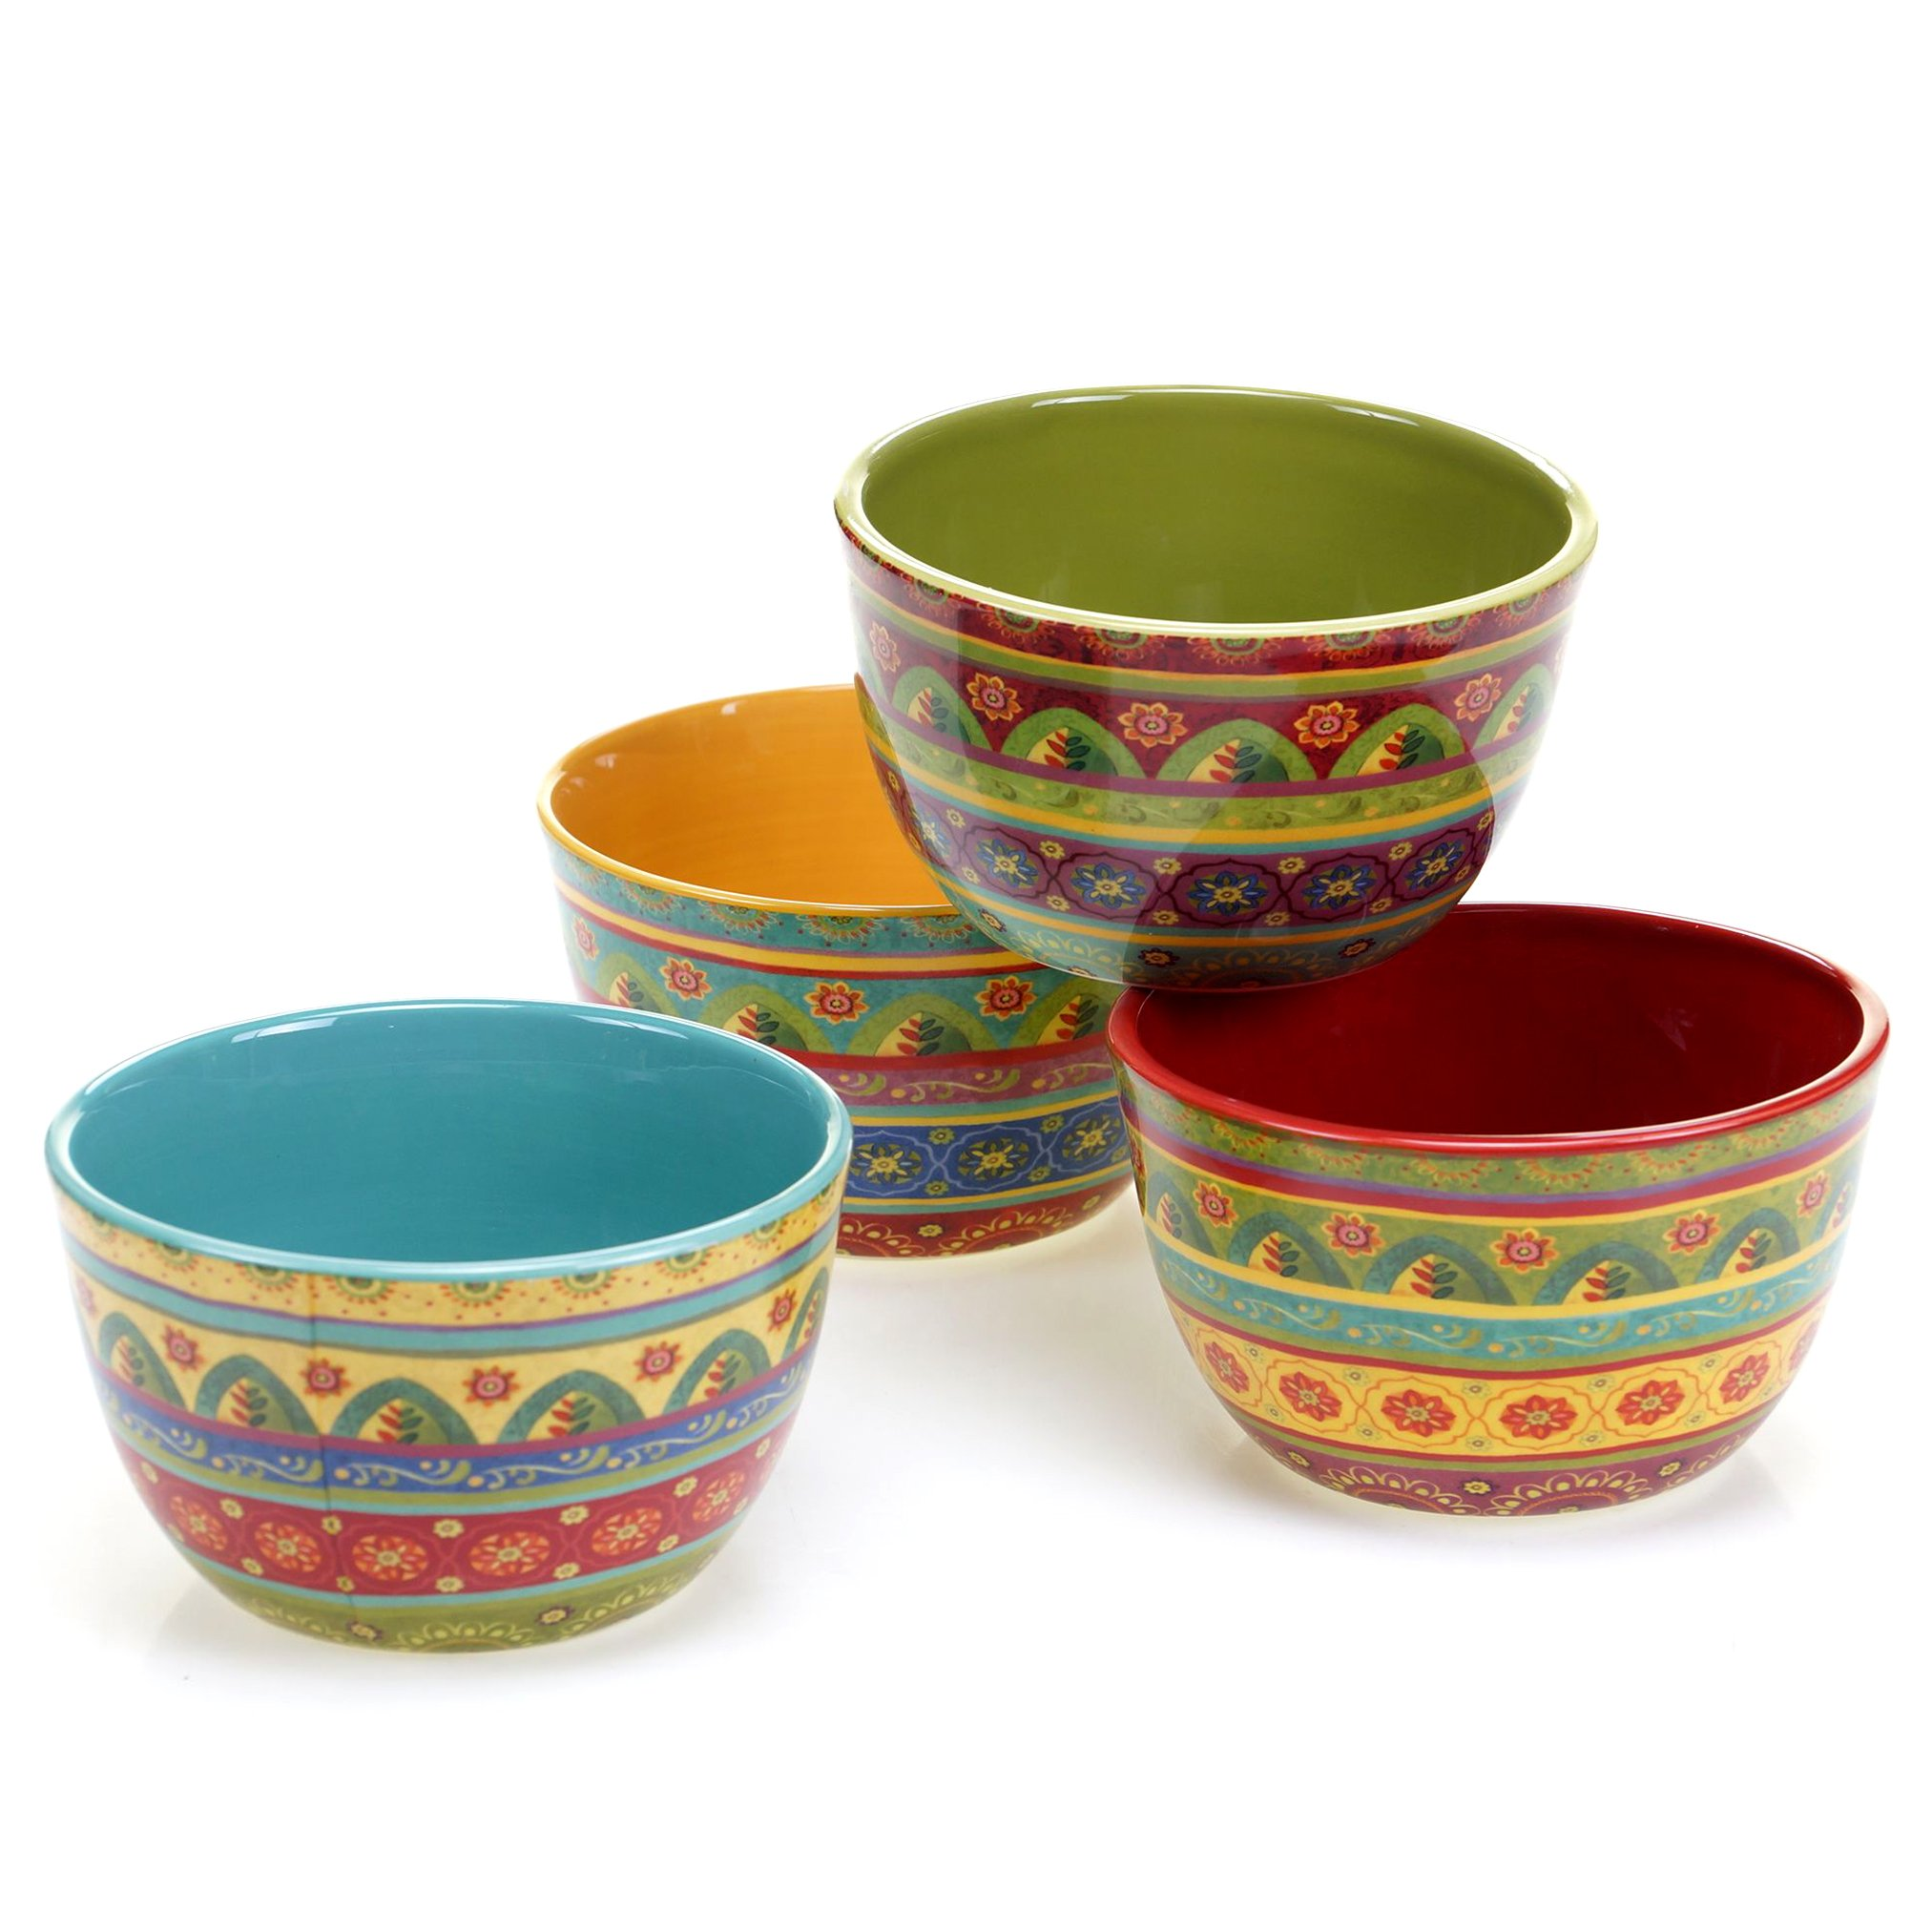 Certified International 22453SET/4 Tunisian Sunset Ice Cream Bowls (Set of 4), 5.25'', Multicolor